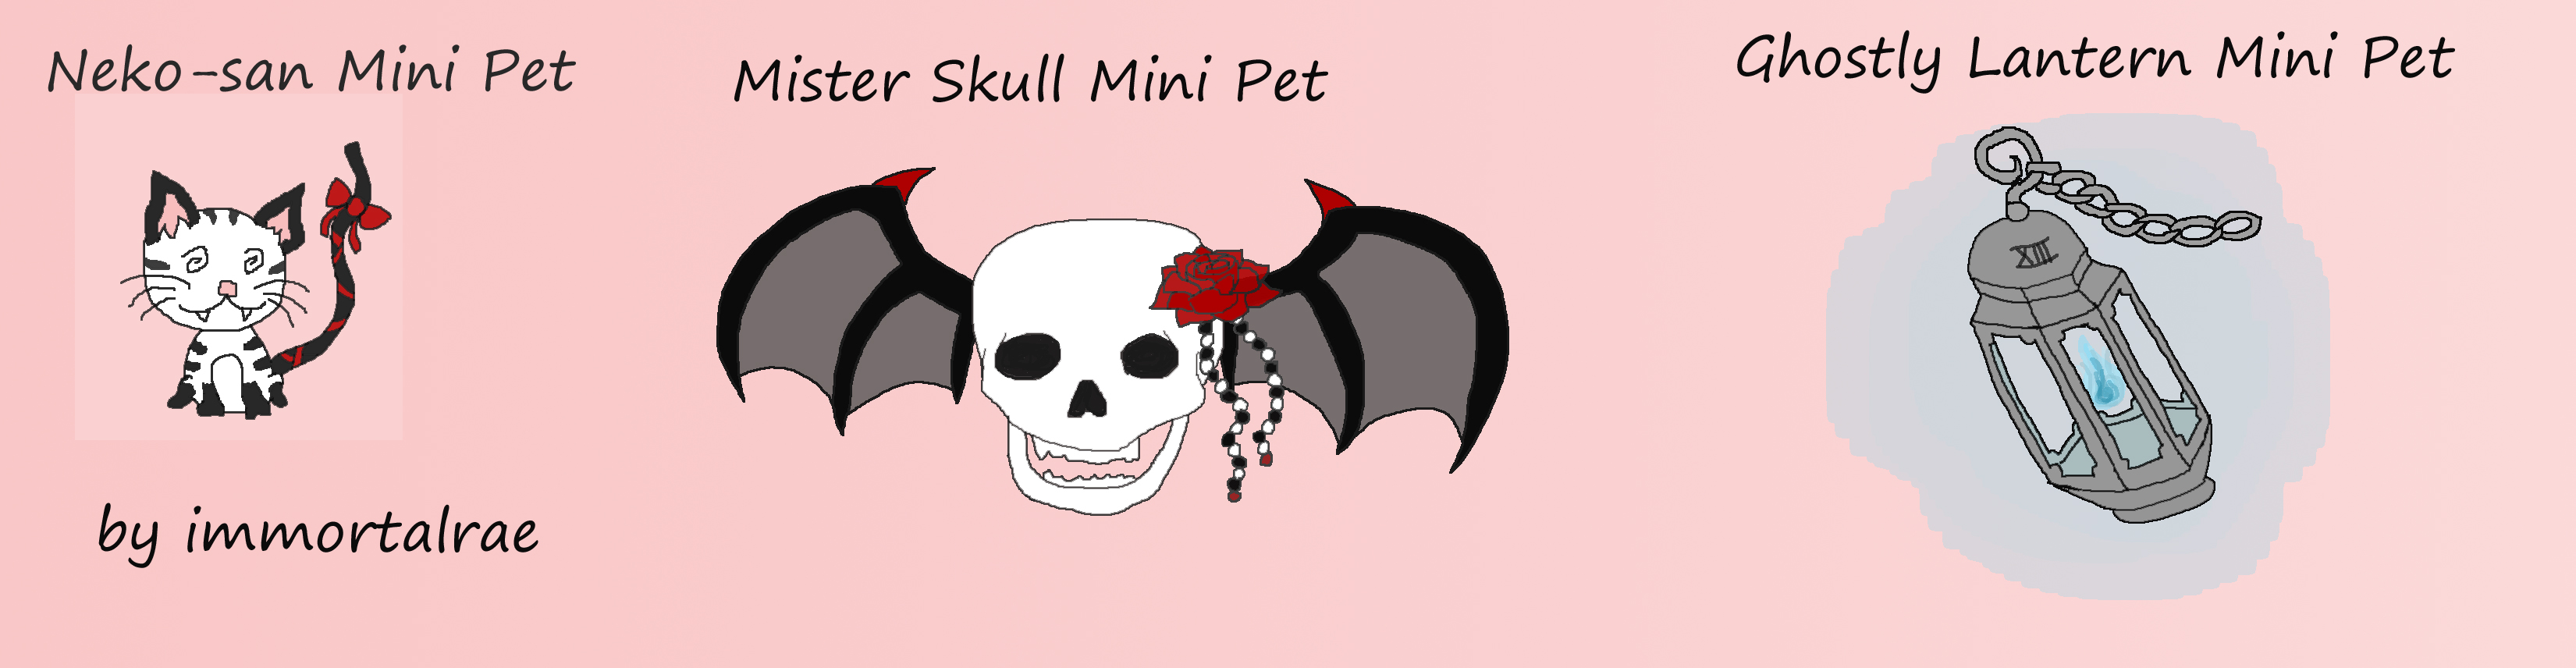 goth_lolita_mini_pets_by_immortalrae-d7rlzk1.jpg